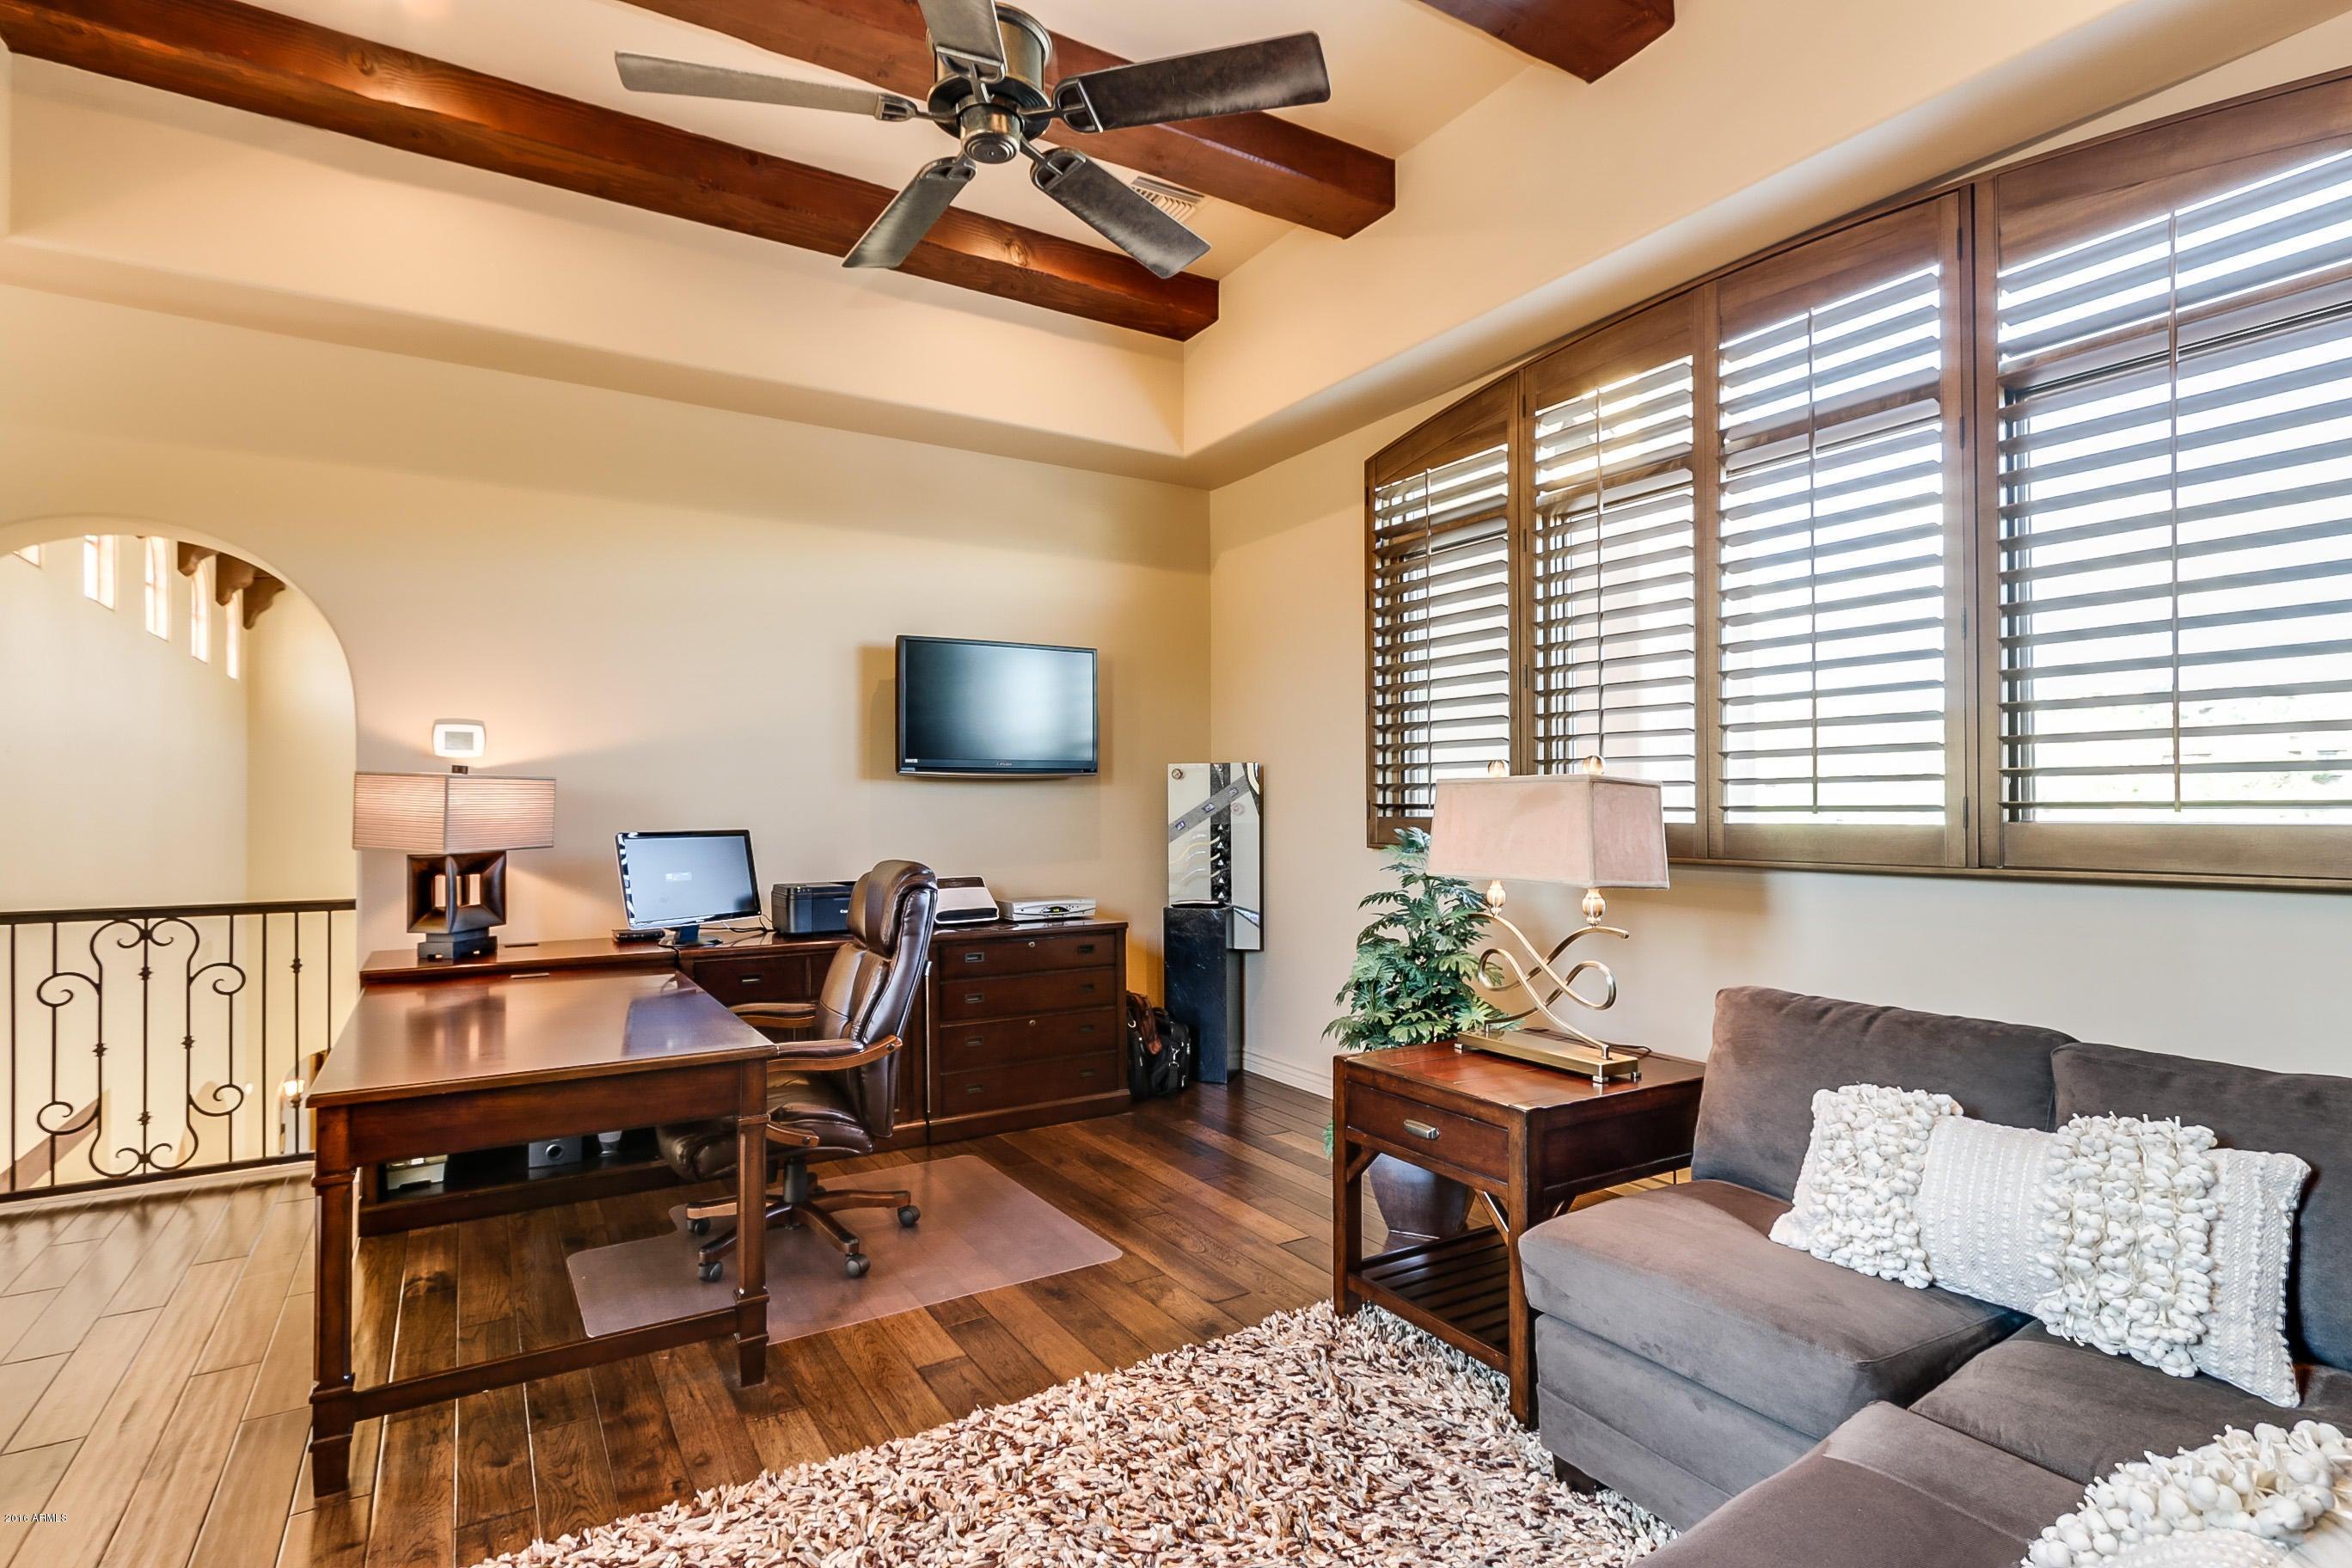 9205 N Fireridge Trail Fountain Hills, AZ 85268 - MLS #: 5670625